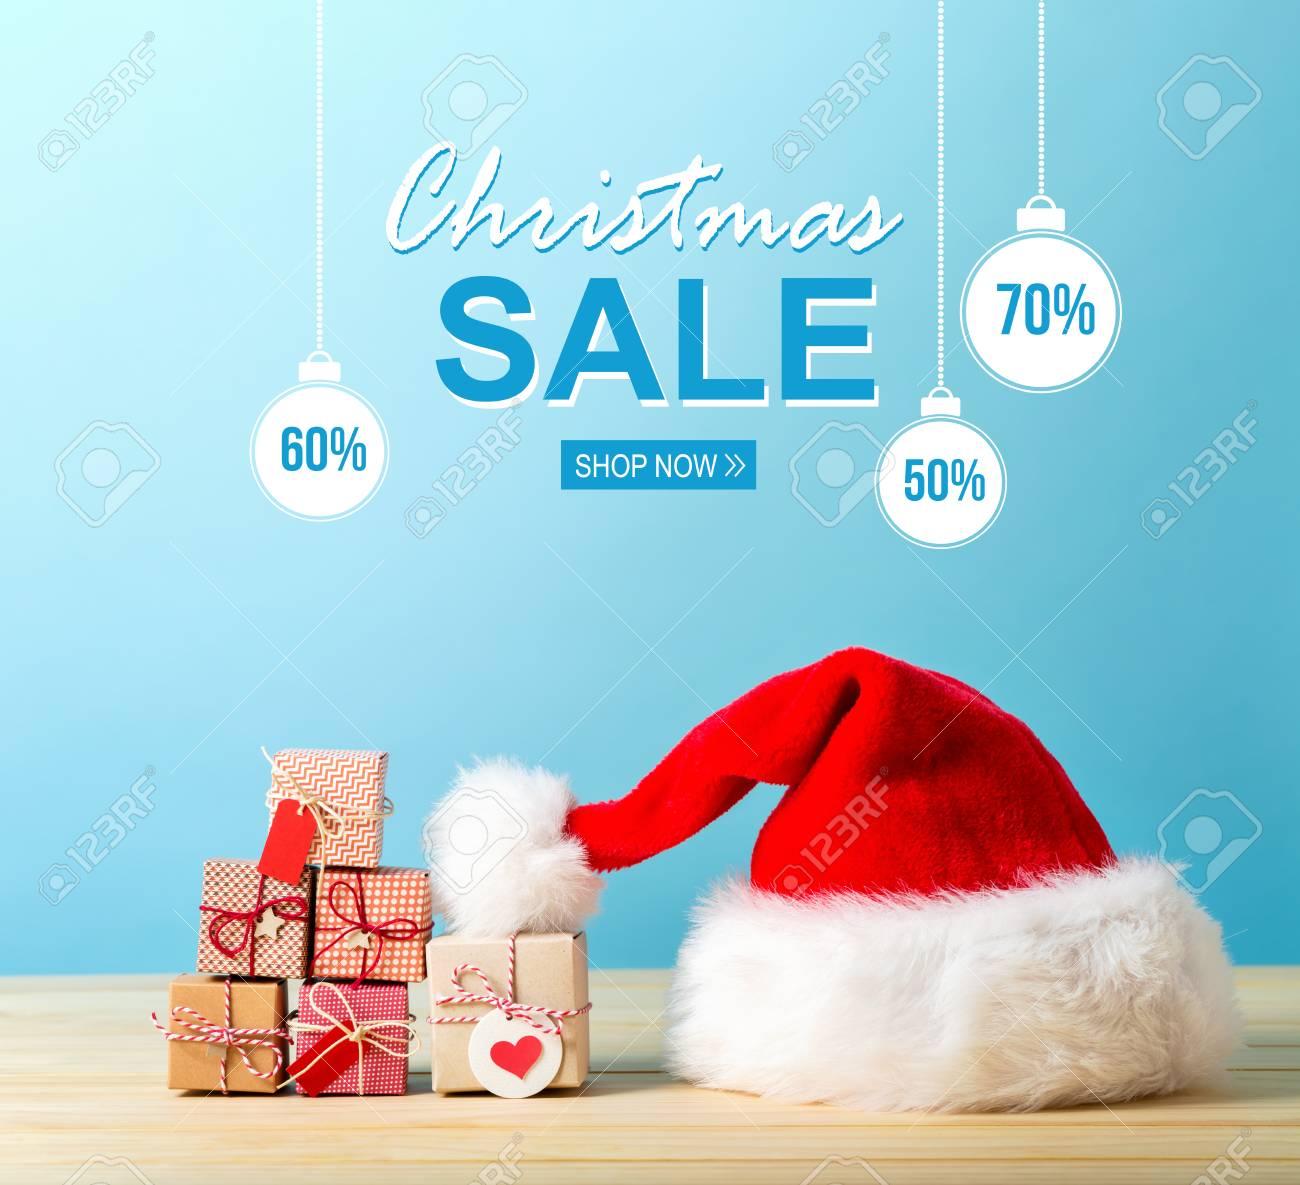 Christmas Sale Message With A Santa Hat And Tiny Christmas Gift ...